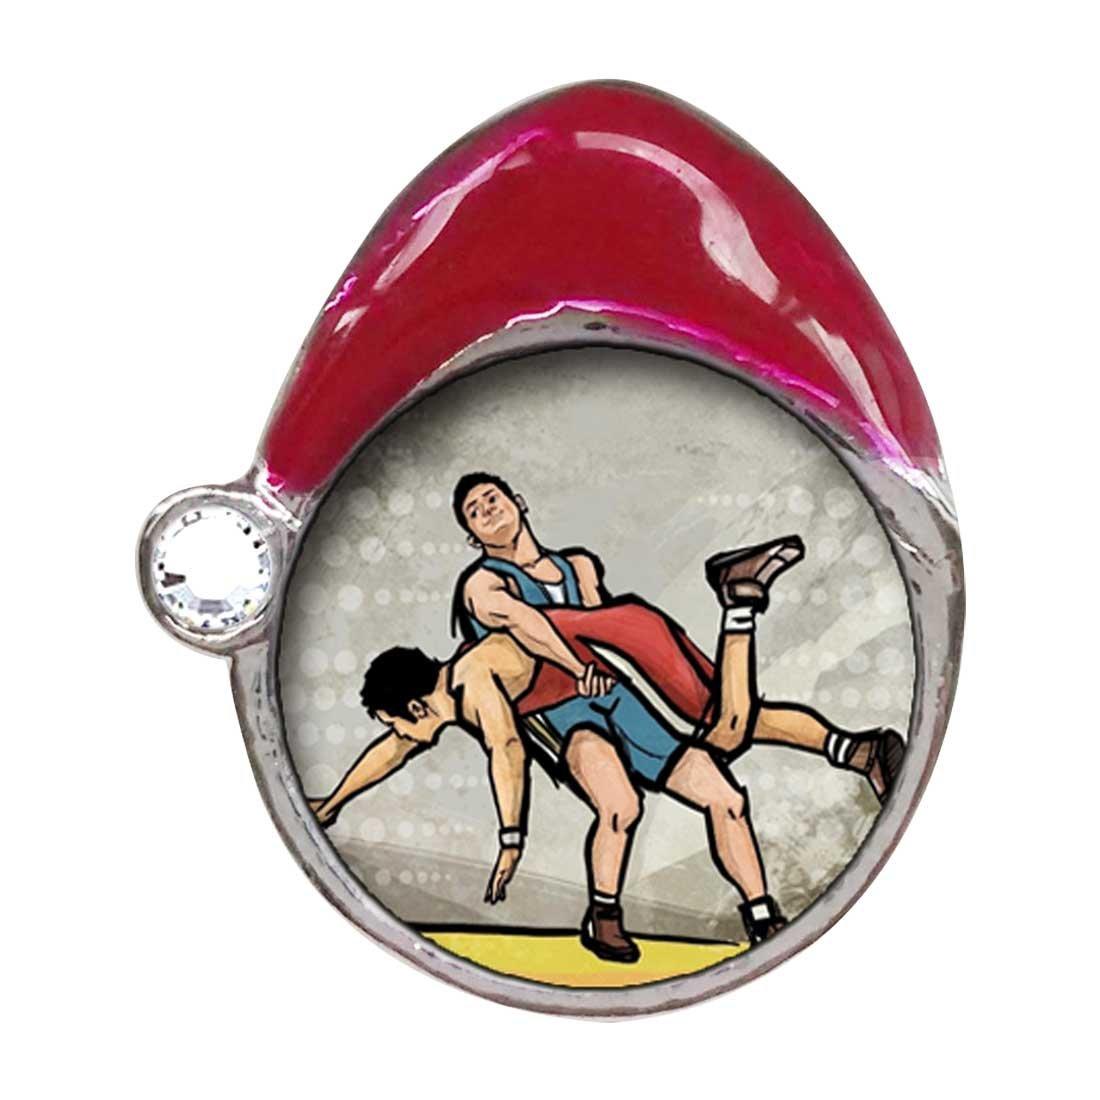 Olympics Wrestling White Crystal April Birthstone Red Santa Hat Charm Bracelets